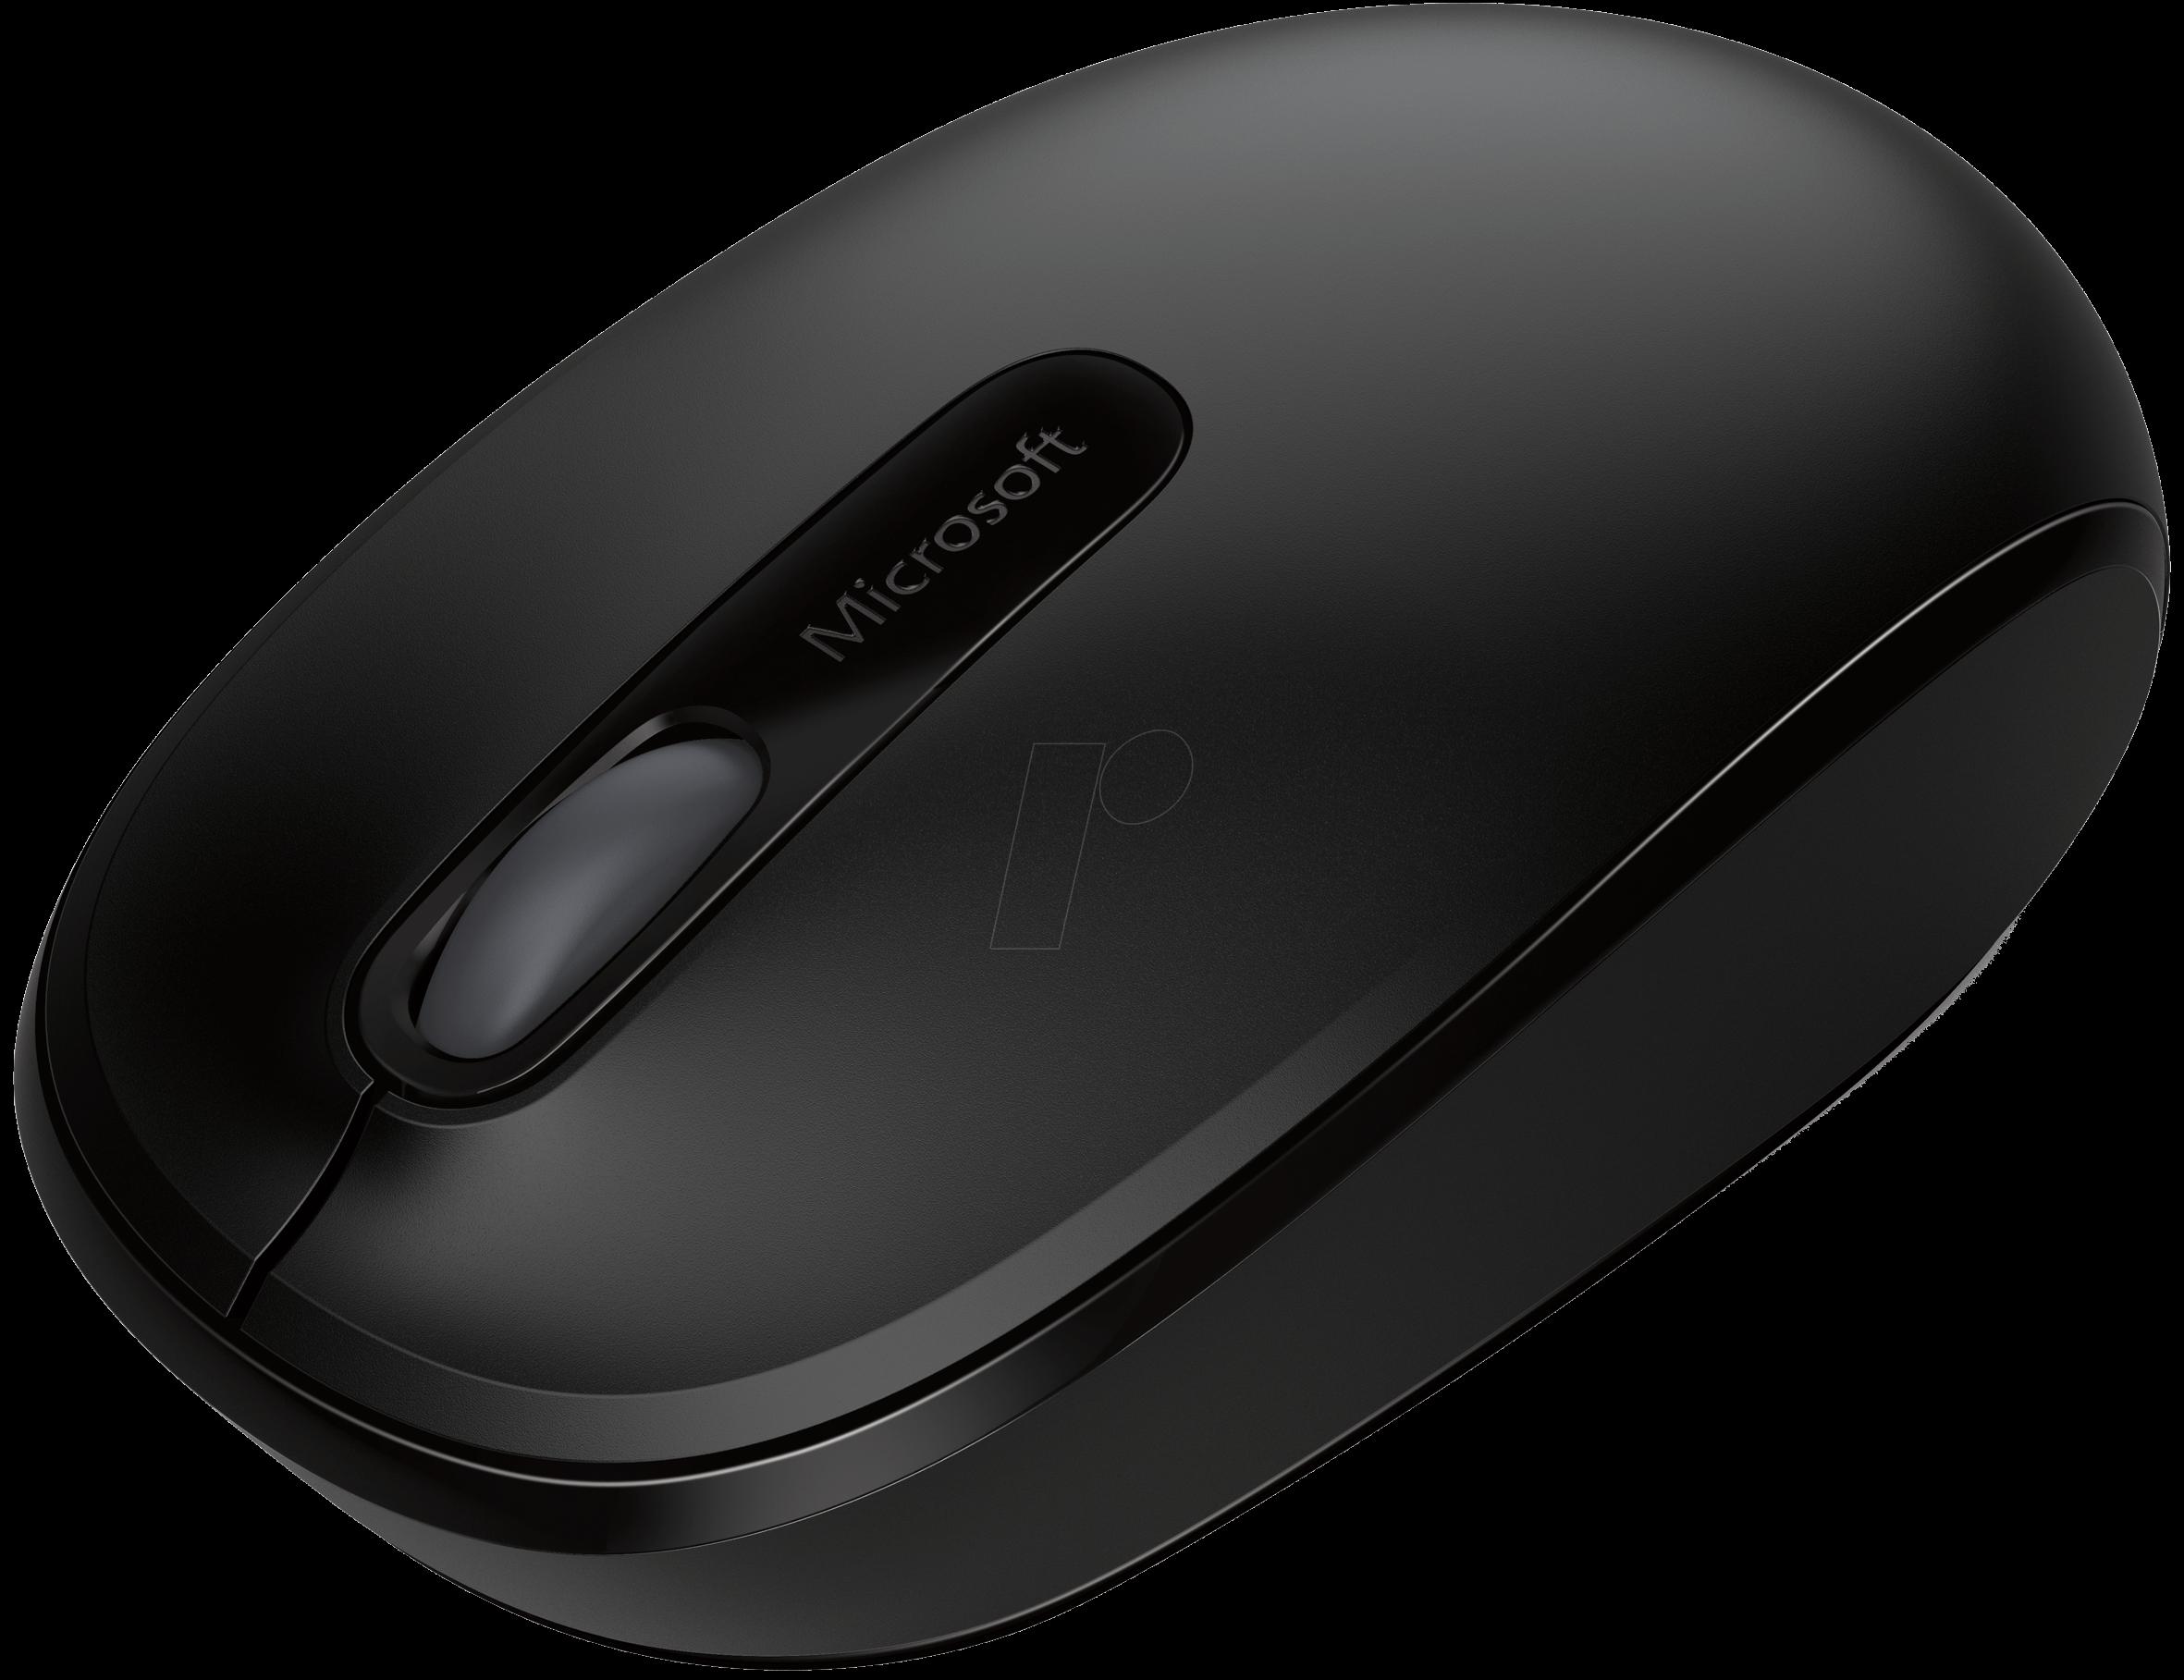 MS WMM 1850 SW - Wireless Mouse - black